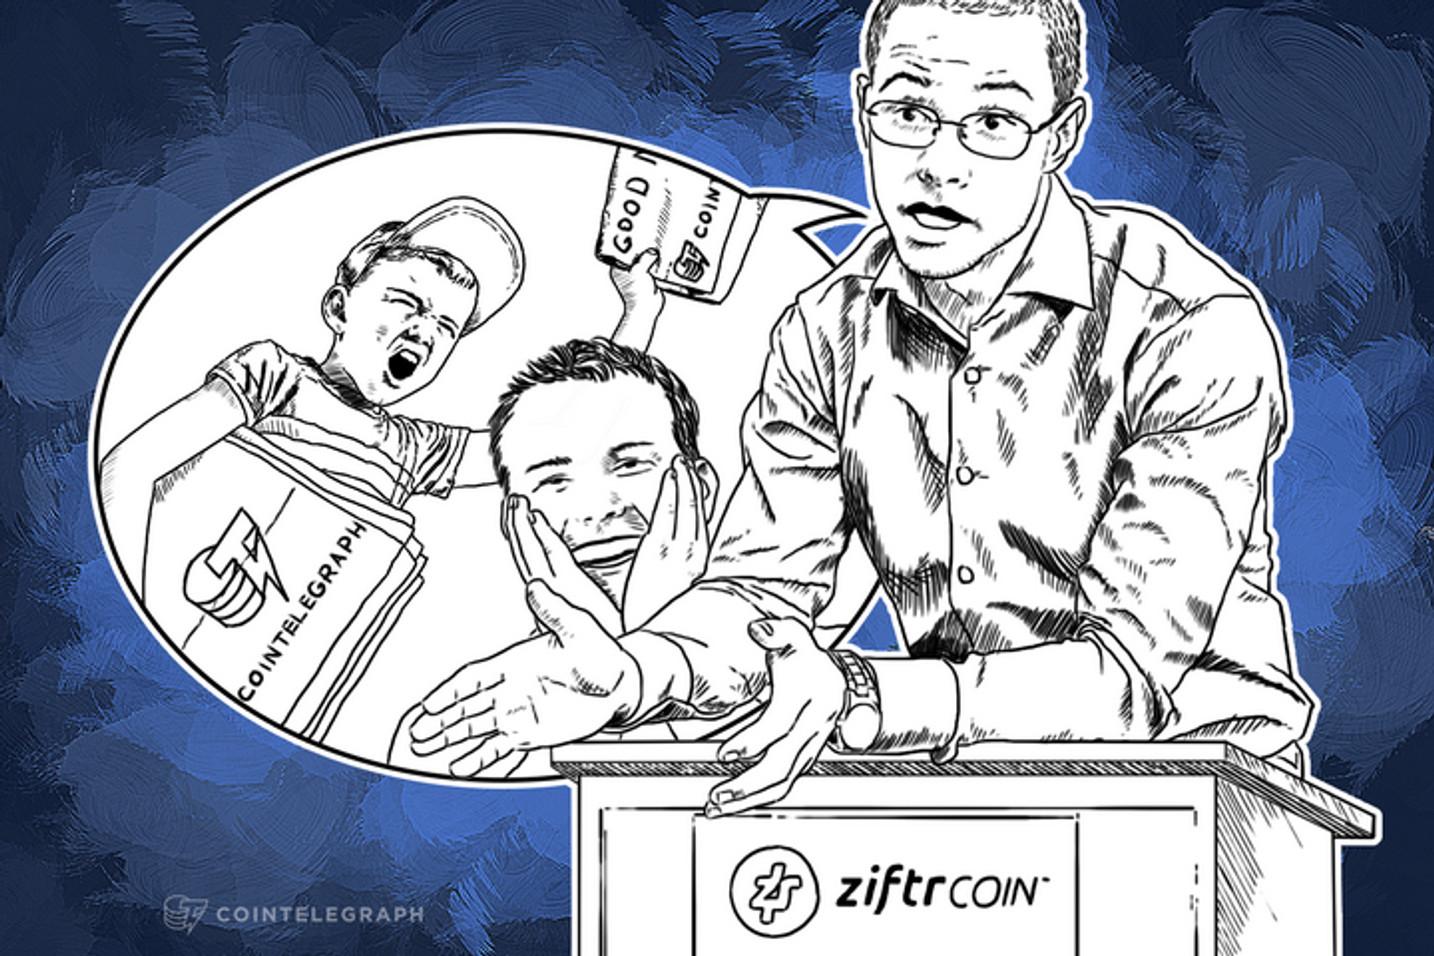 How Bitcoin Will Achieve Mass Acceptance: Through Community (Op-Ed)